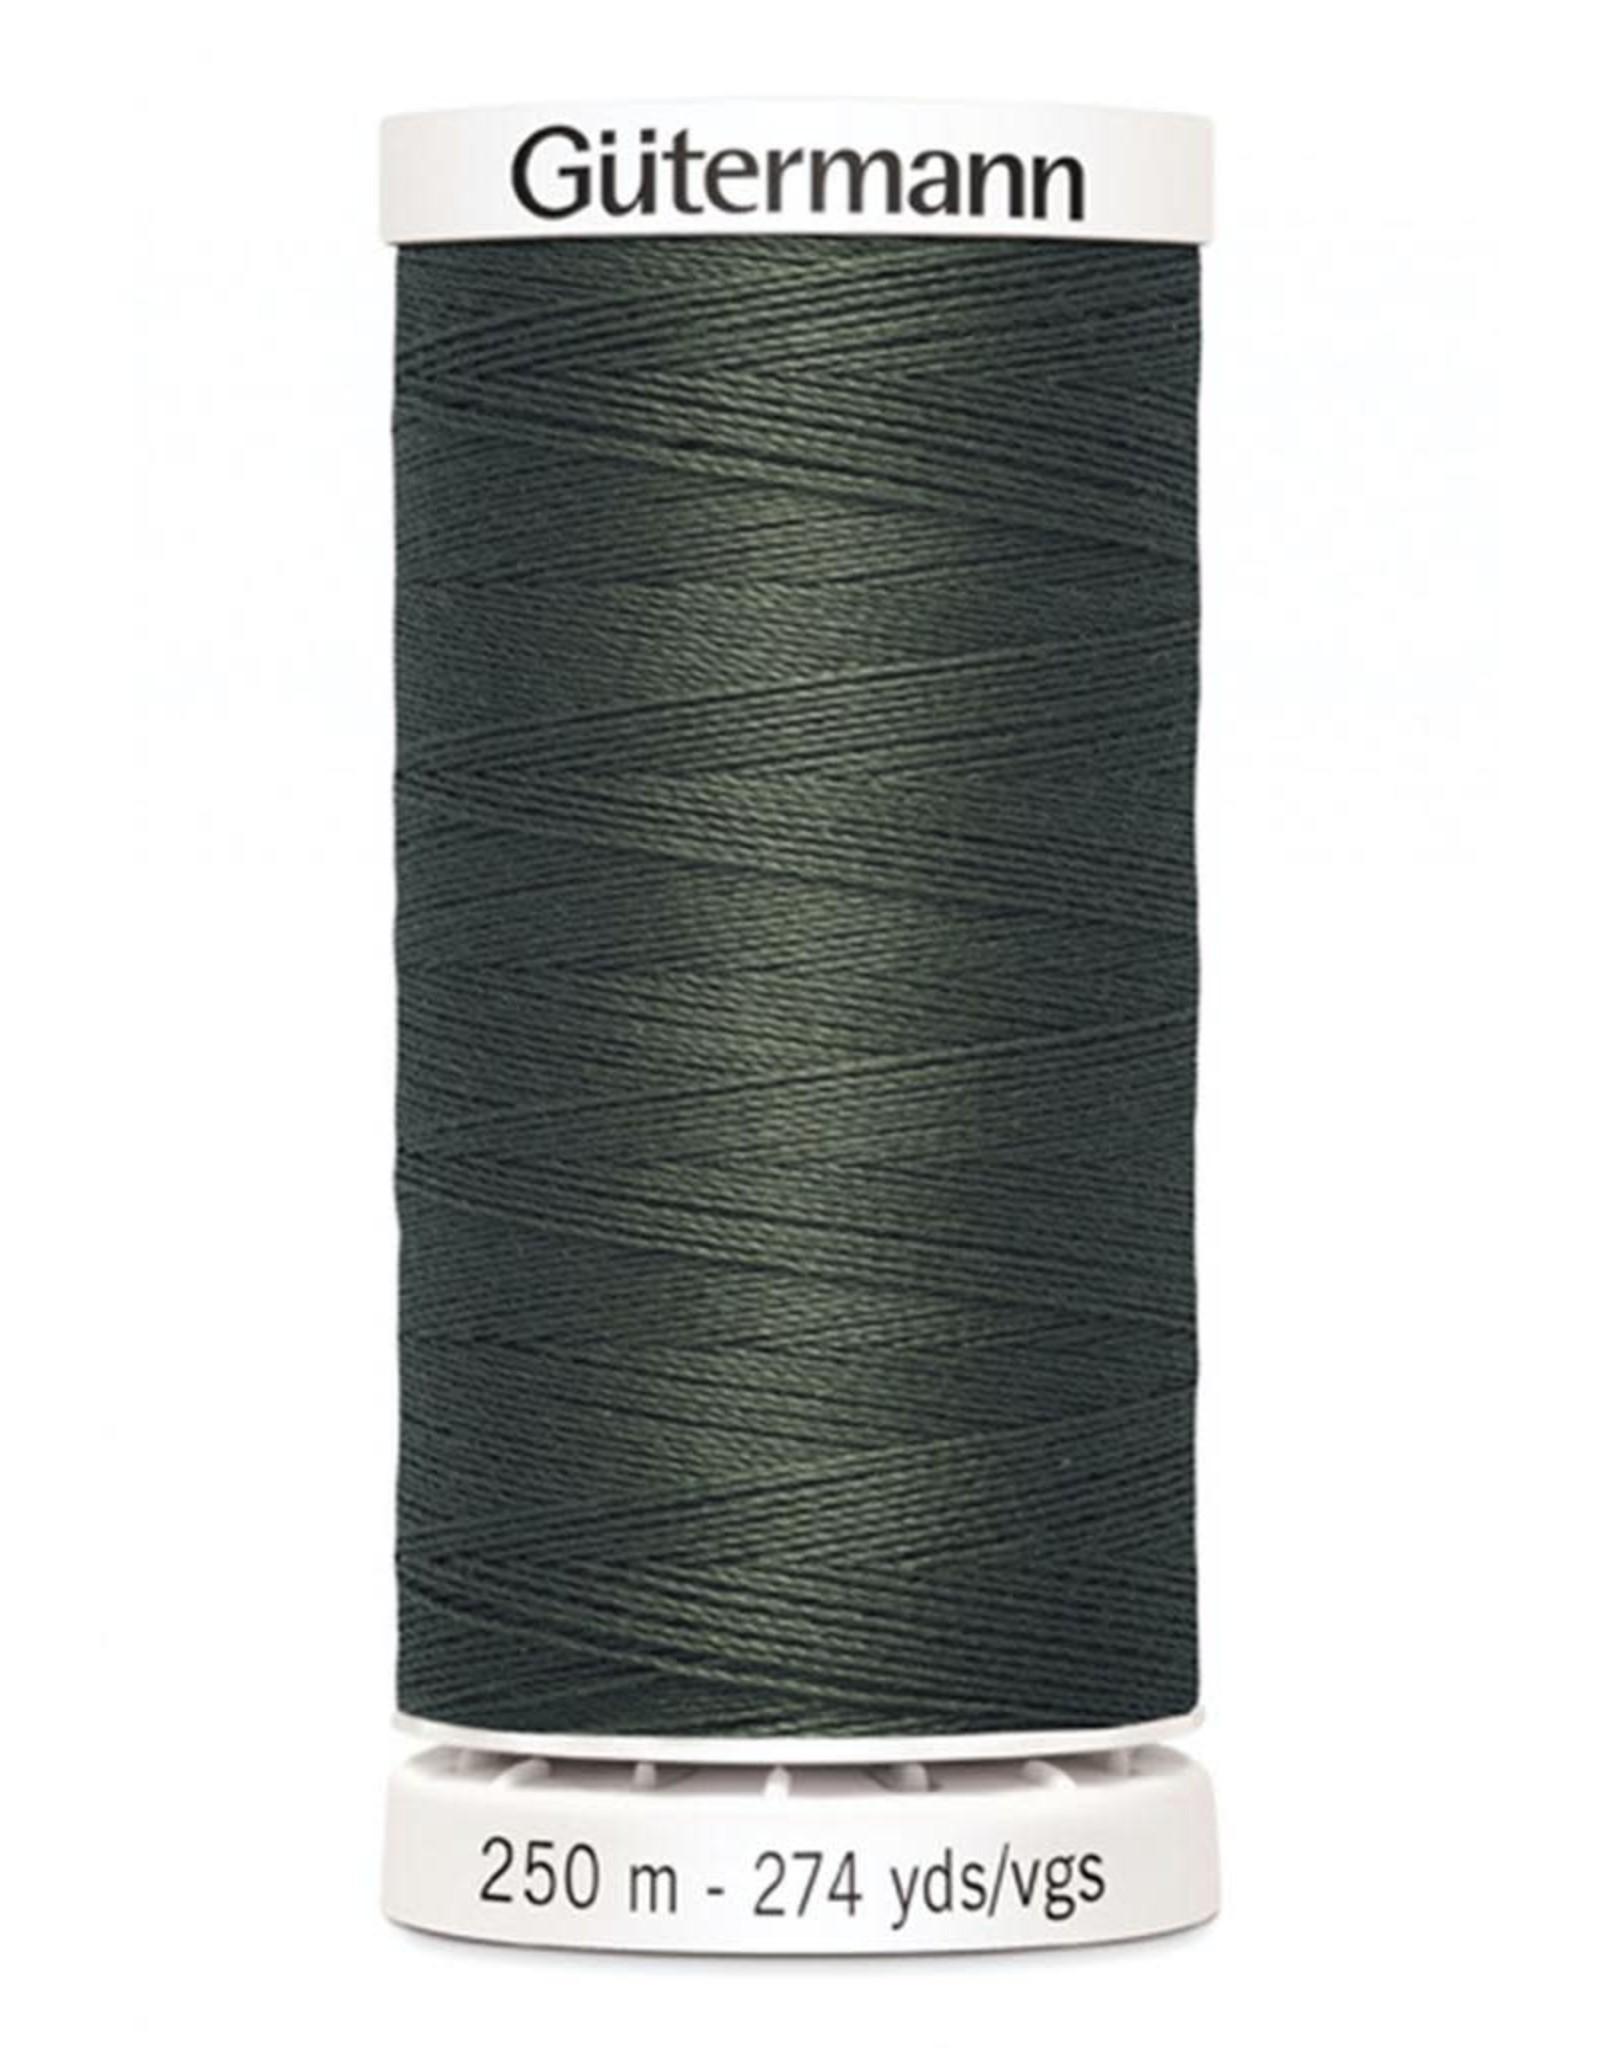 Gutermann Gutermann Thread, 250M-766 Khaki Green, Sew-All Polyester All Purpose Thread, 250m/273yds